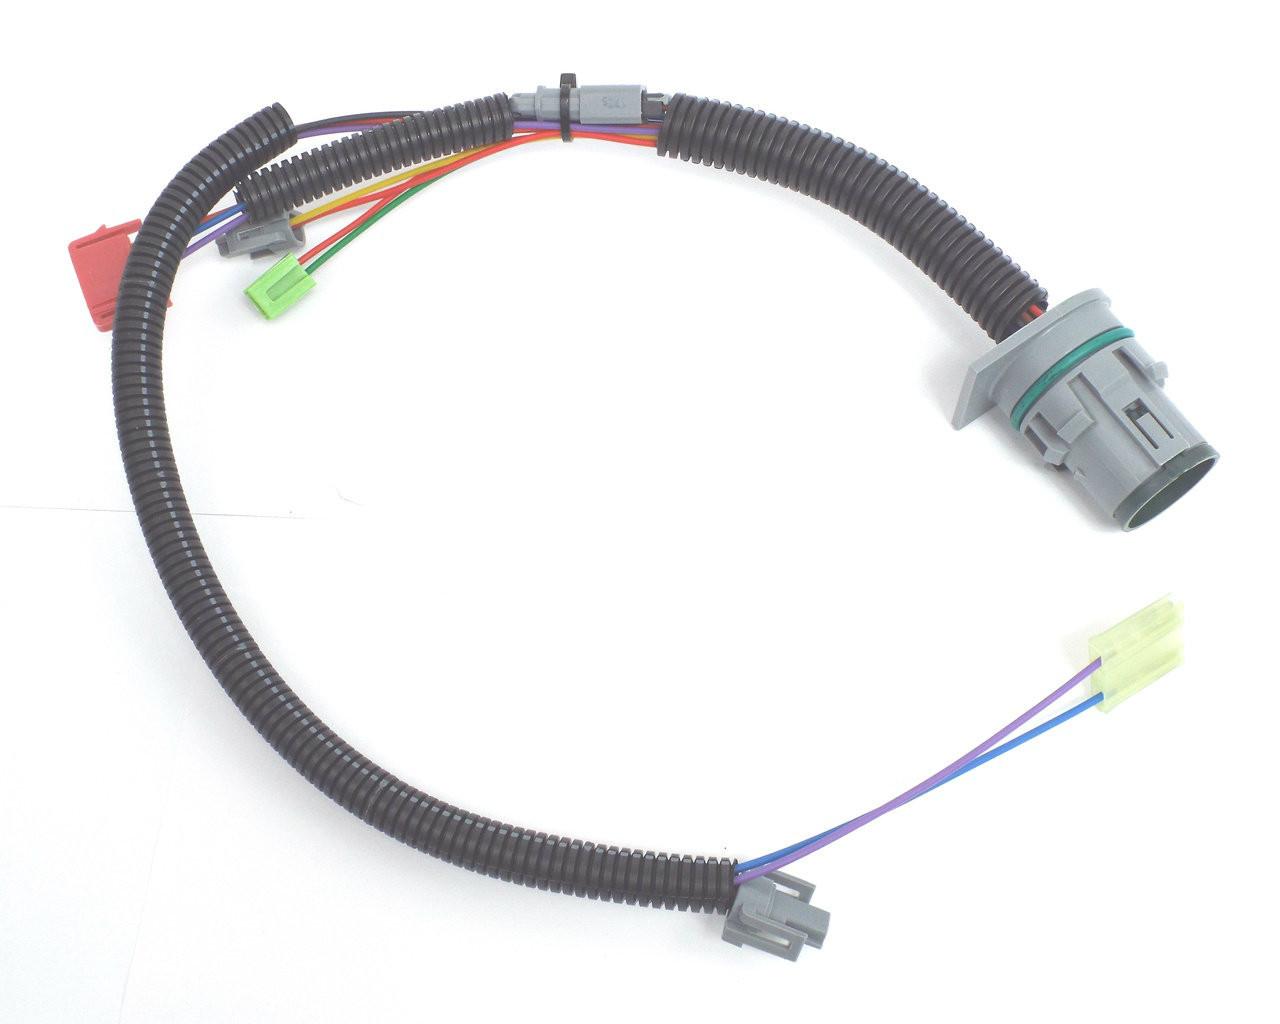 medium resolution of new 4l80e transmission hd internal valve body wiring harness 1991 2003 4l80e internal wiring harness diagram 4l80e internal wiring harness